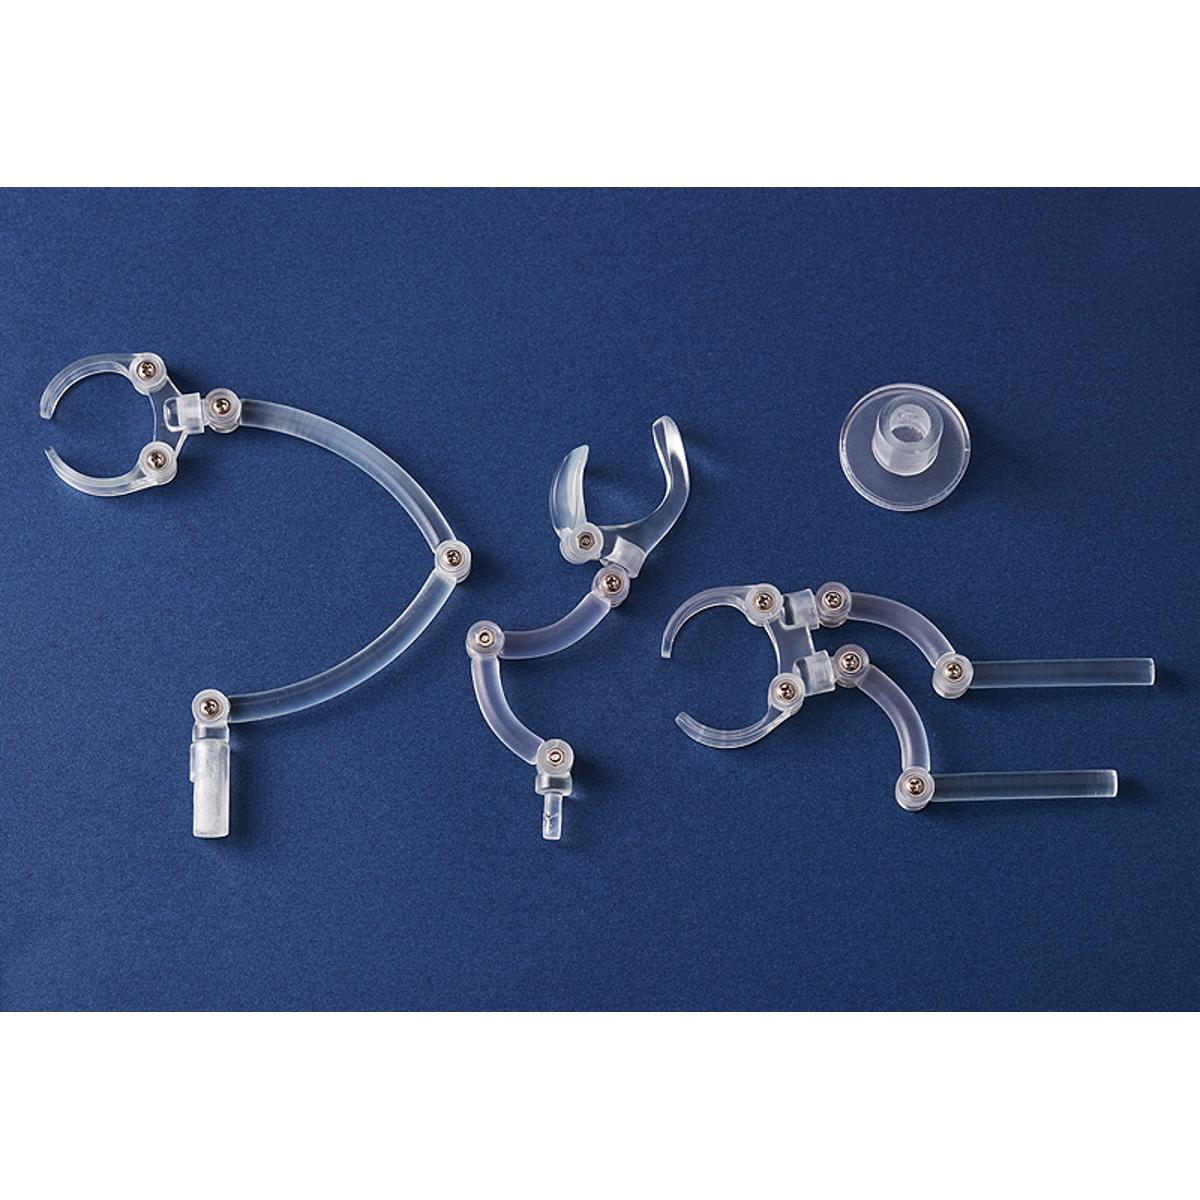 Harmonia Series Support Arm Set